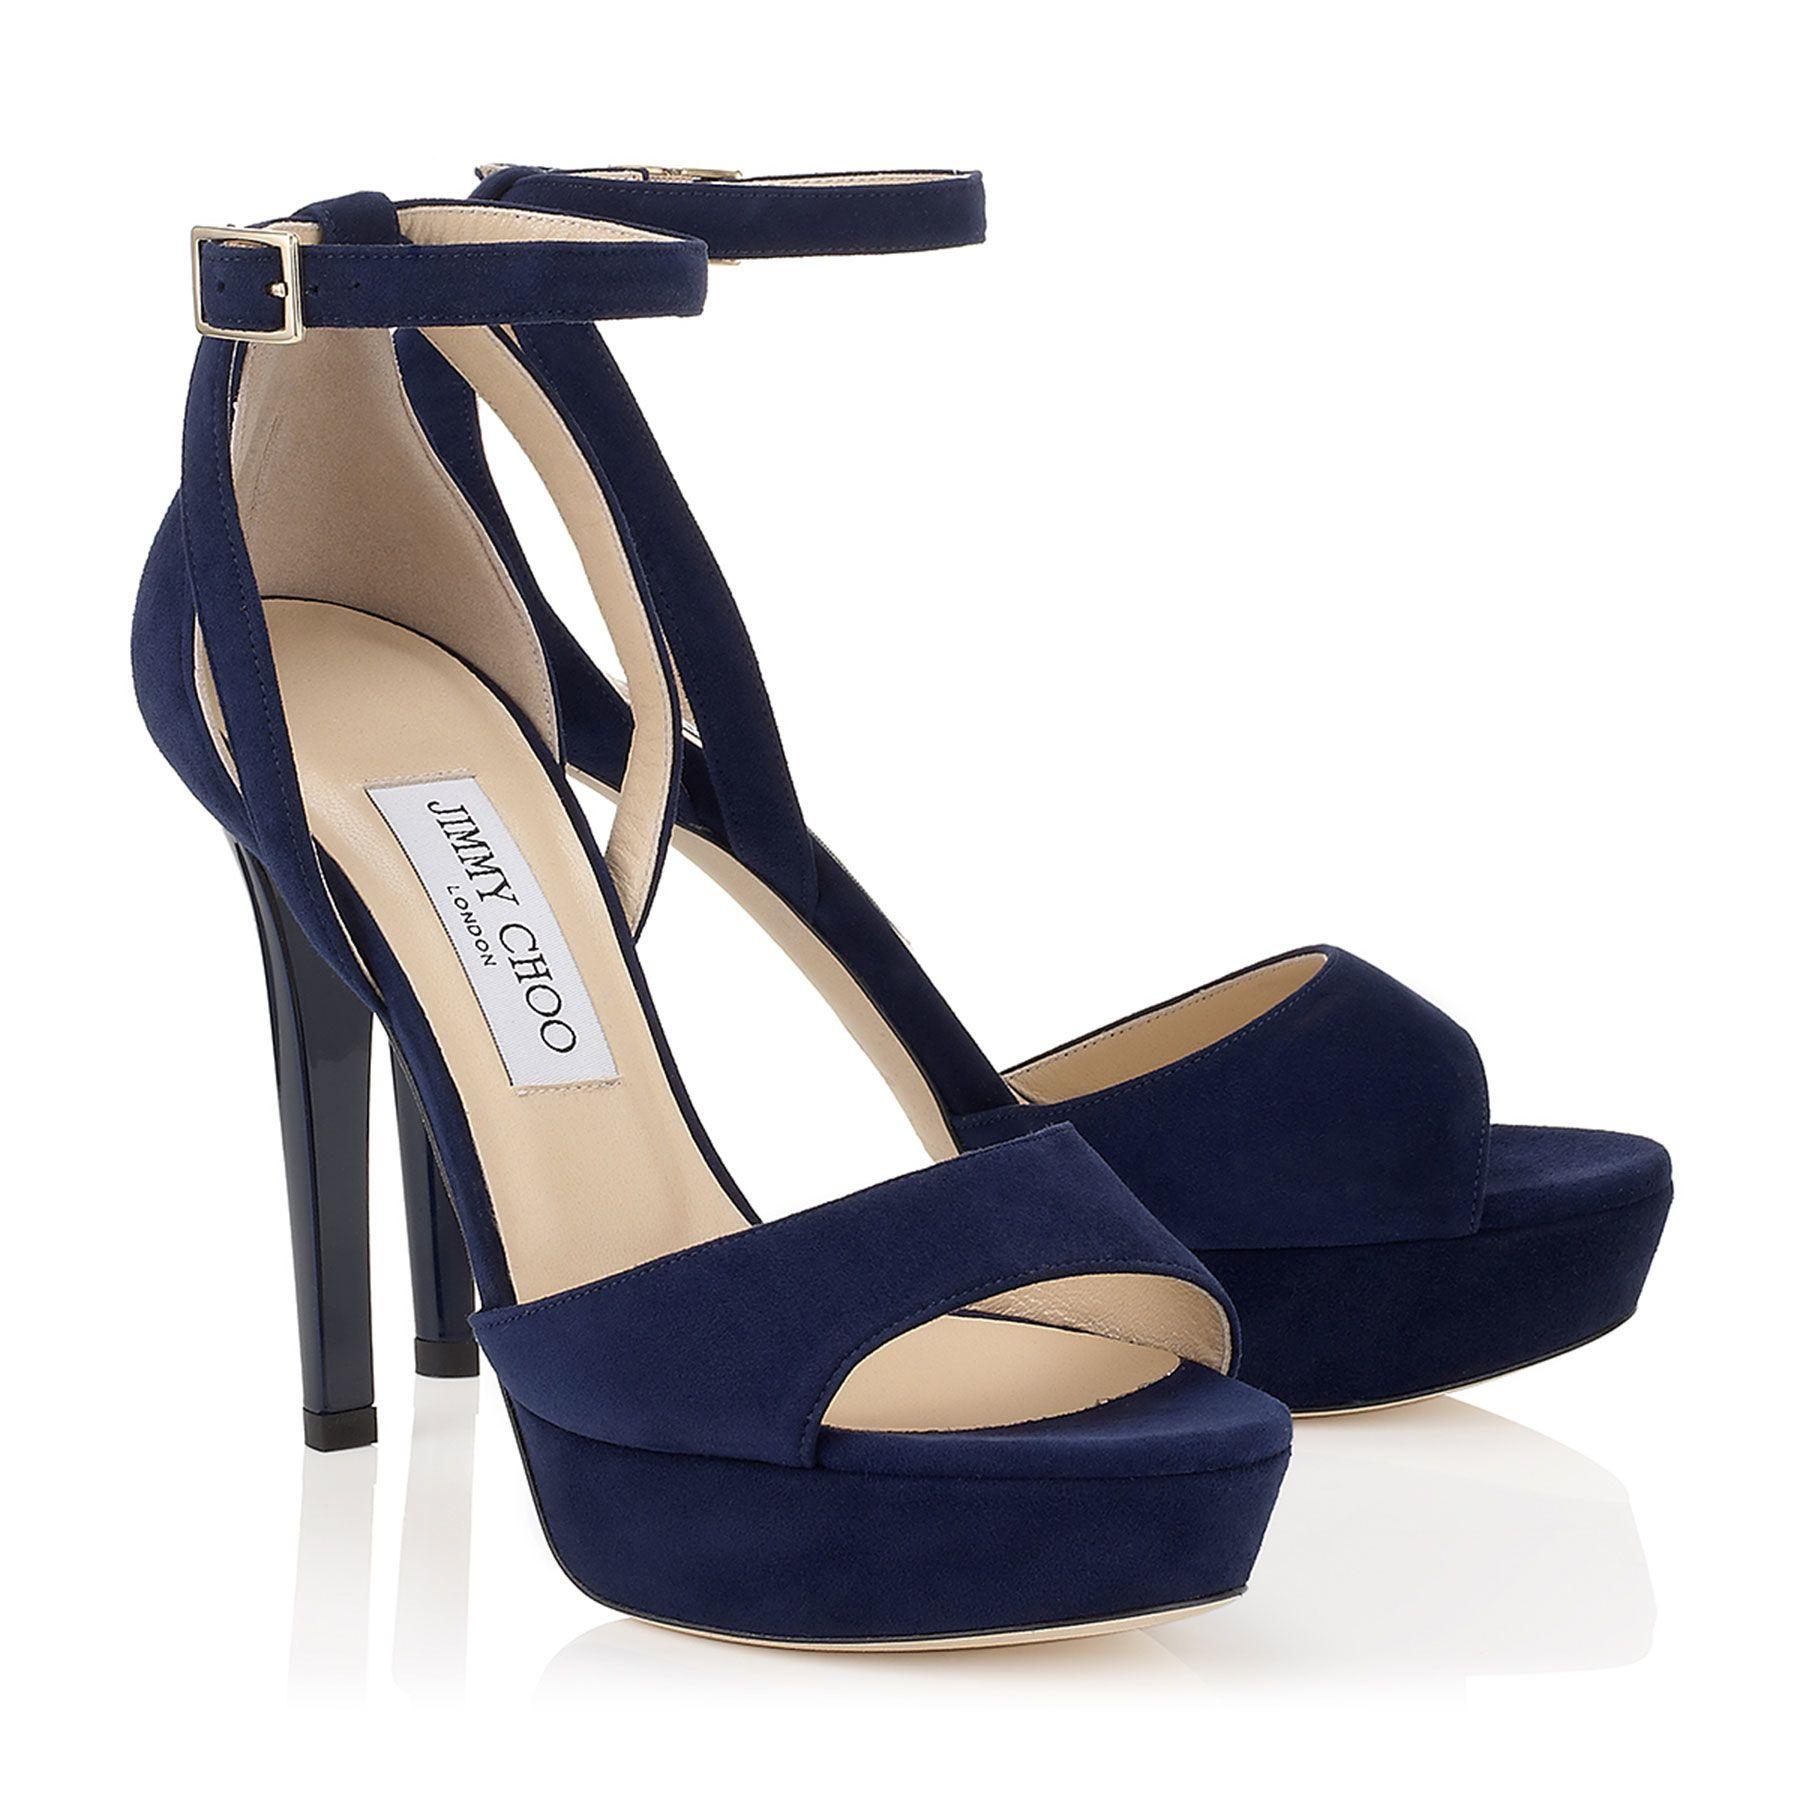 KAYDEN. Women's Shoes SandalsBlack ...